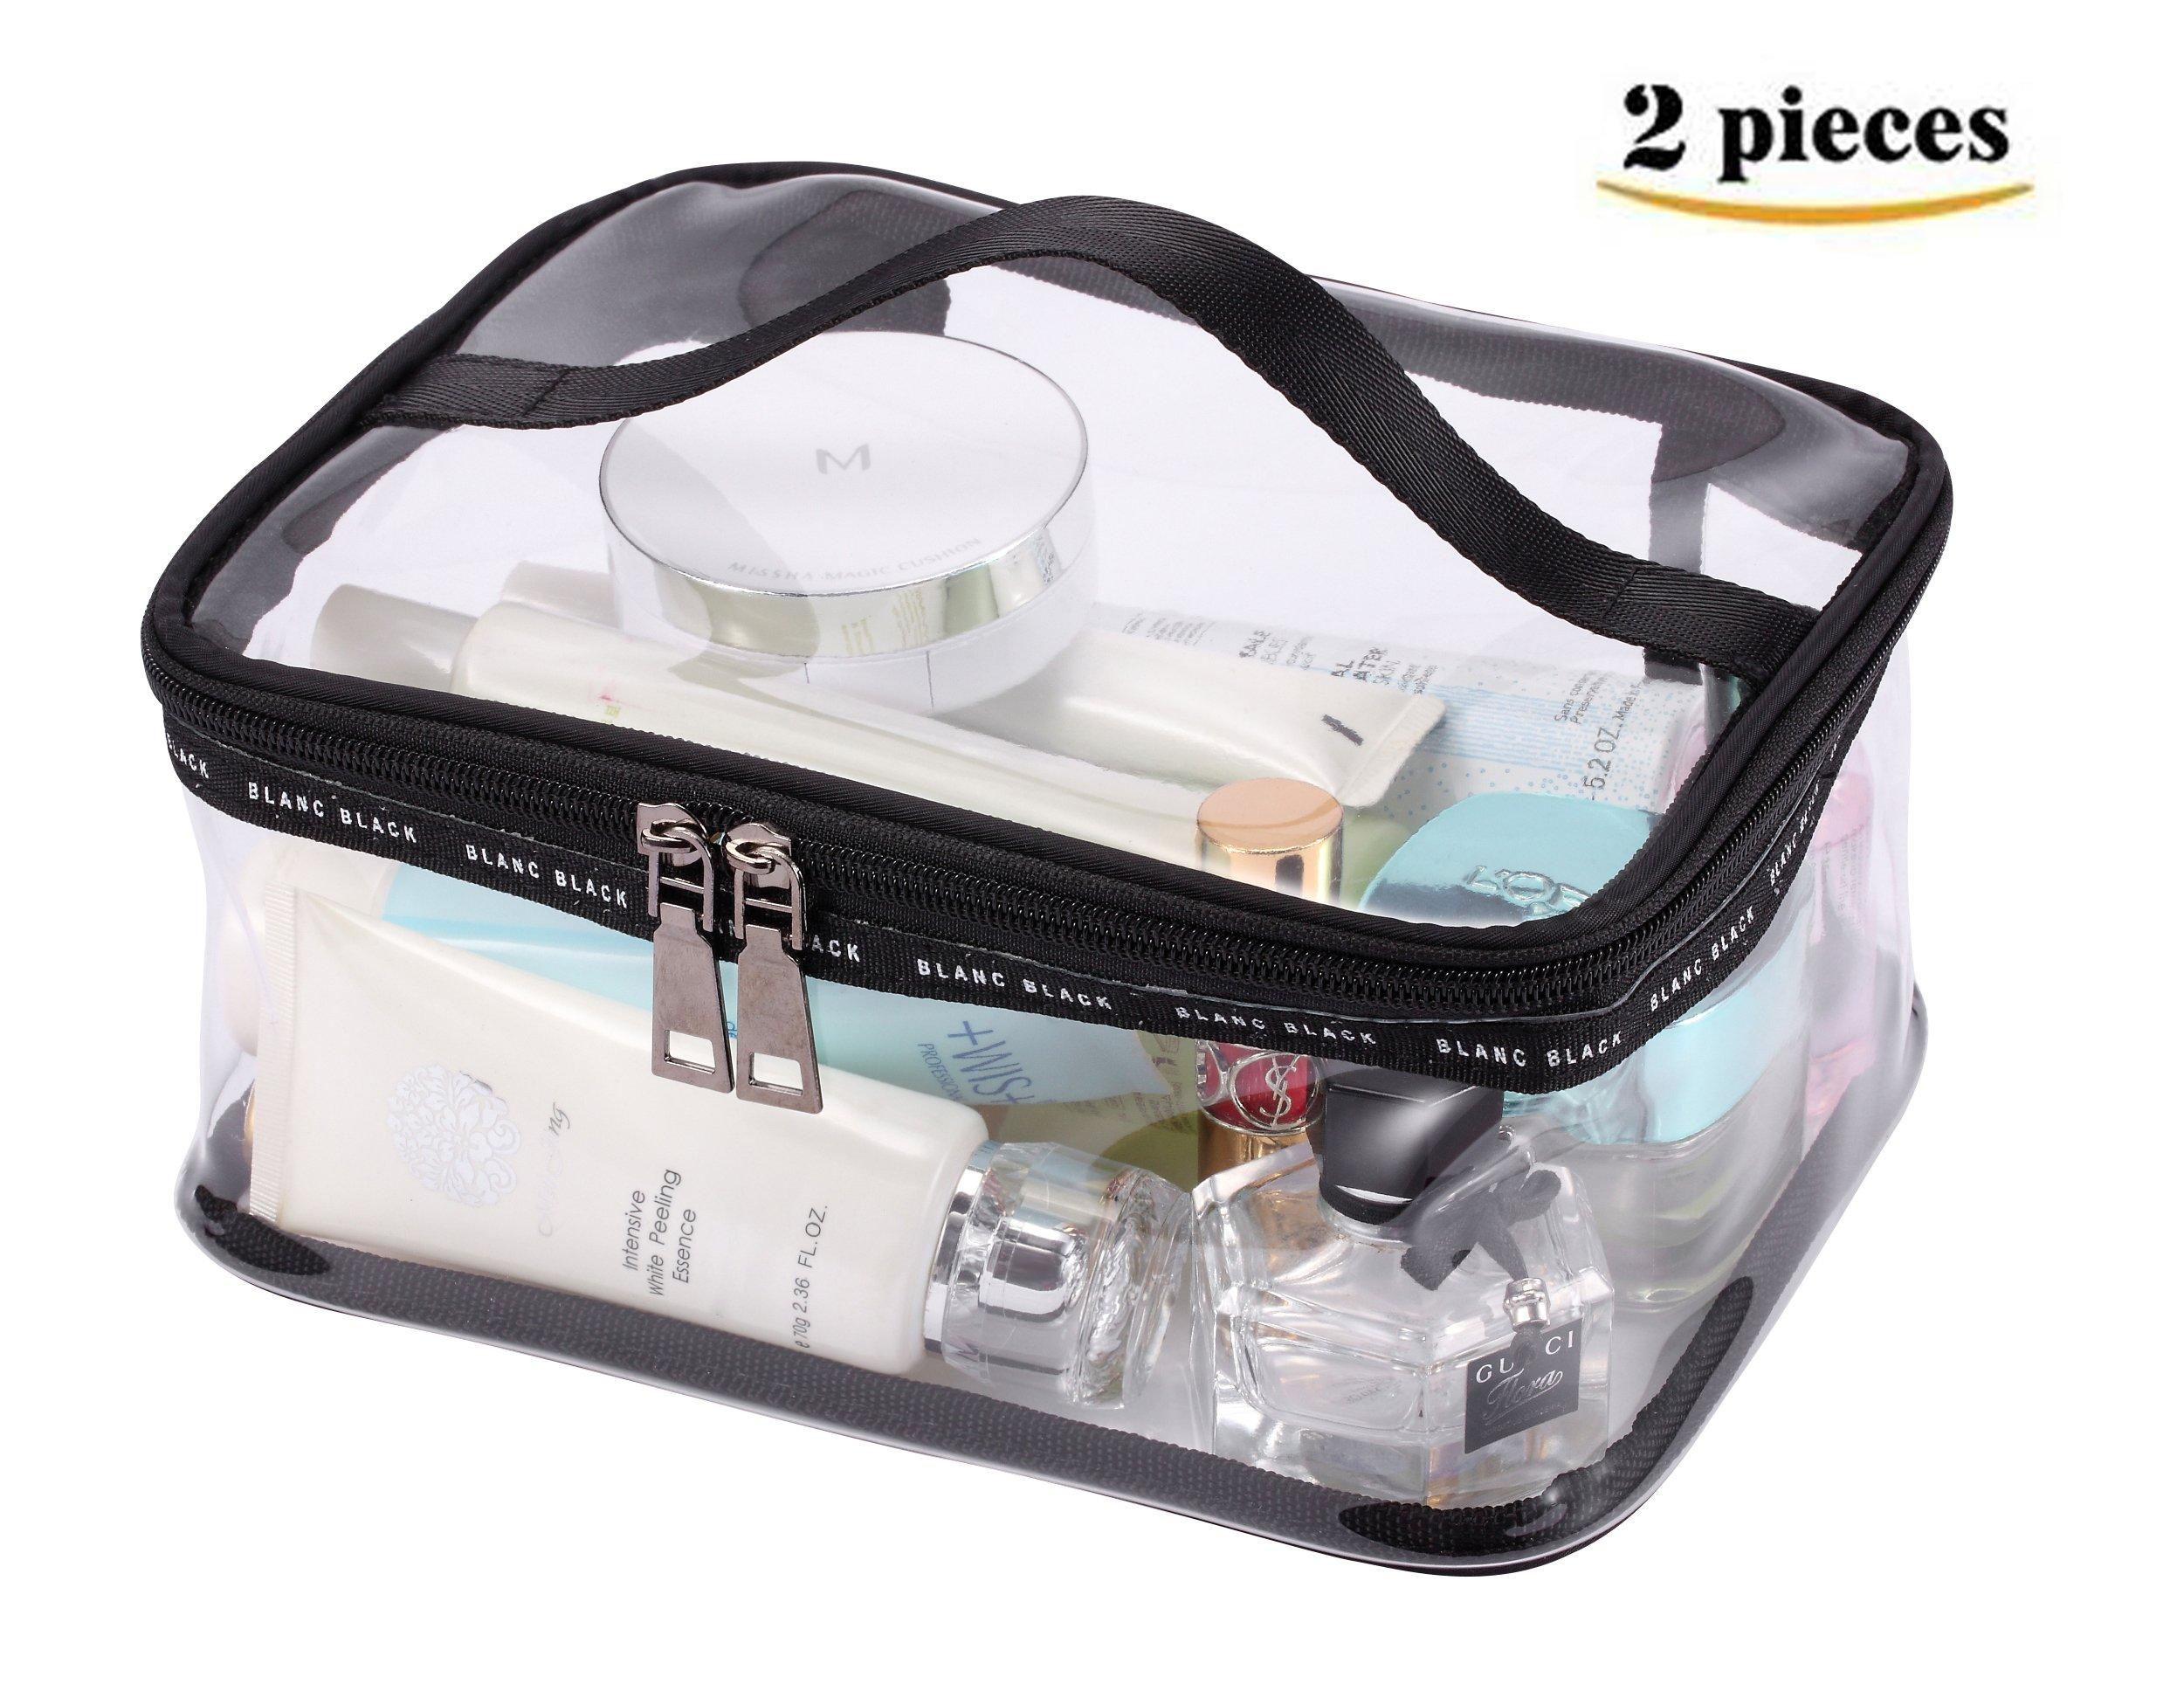 Amazon.com : Clear Toiletry Makeup Bags, PVC Plastic